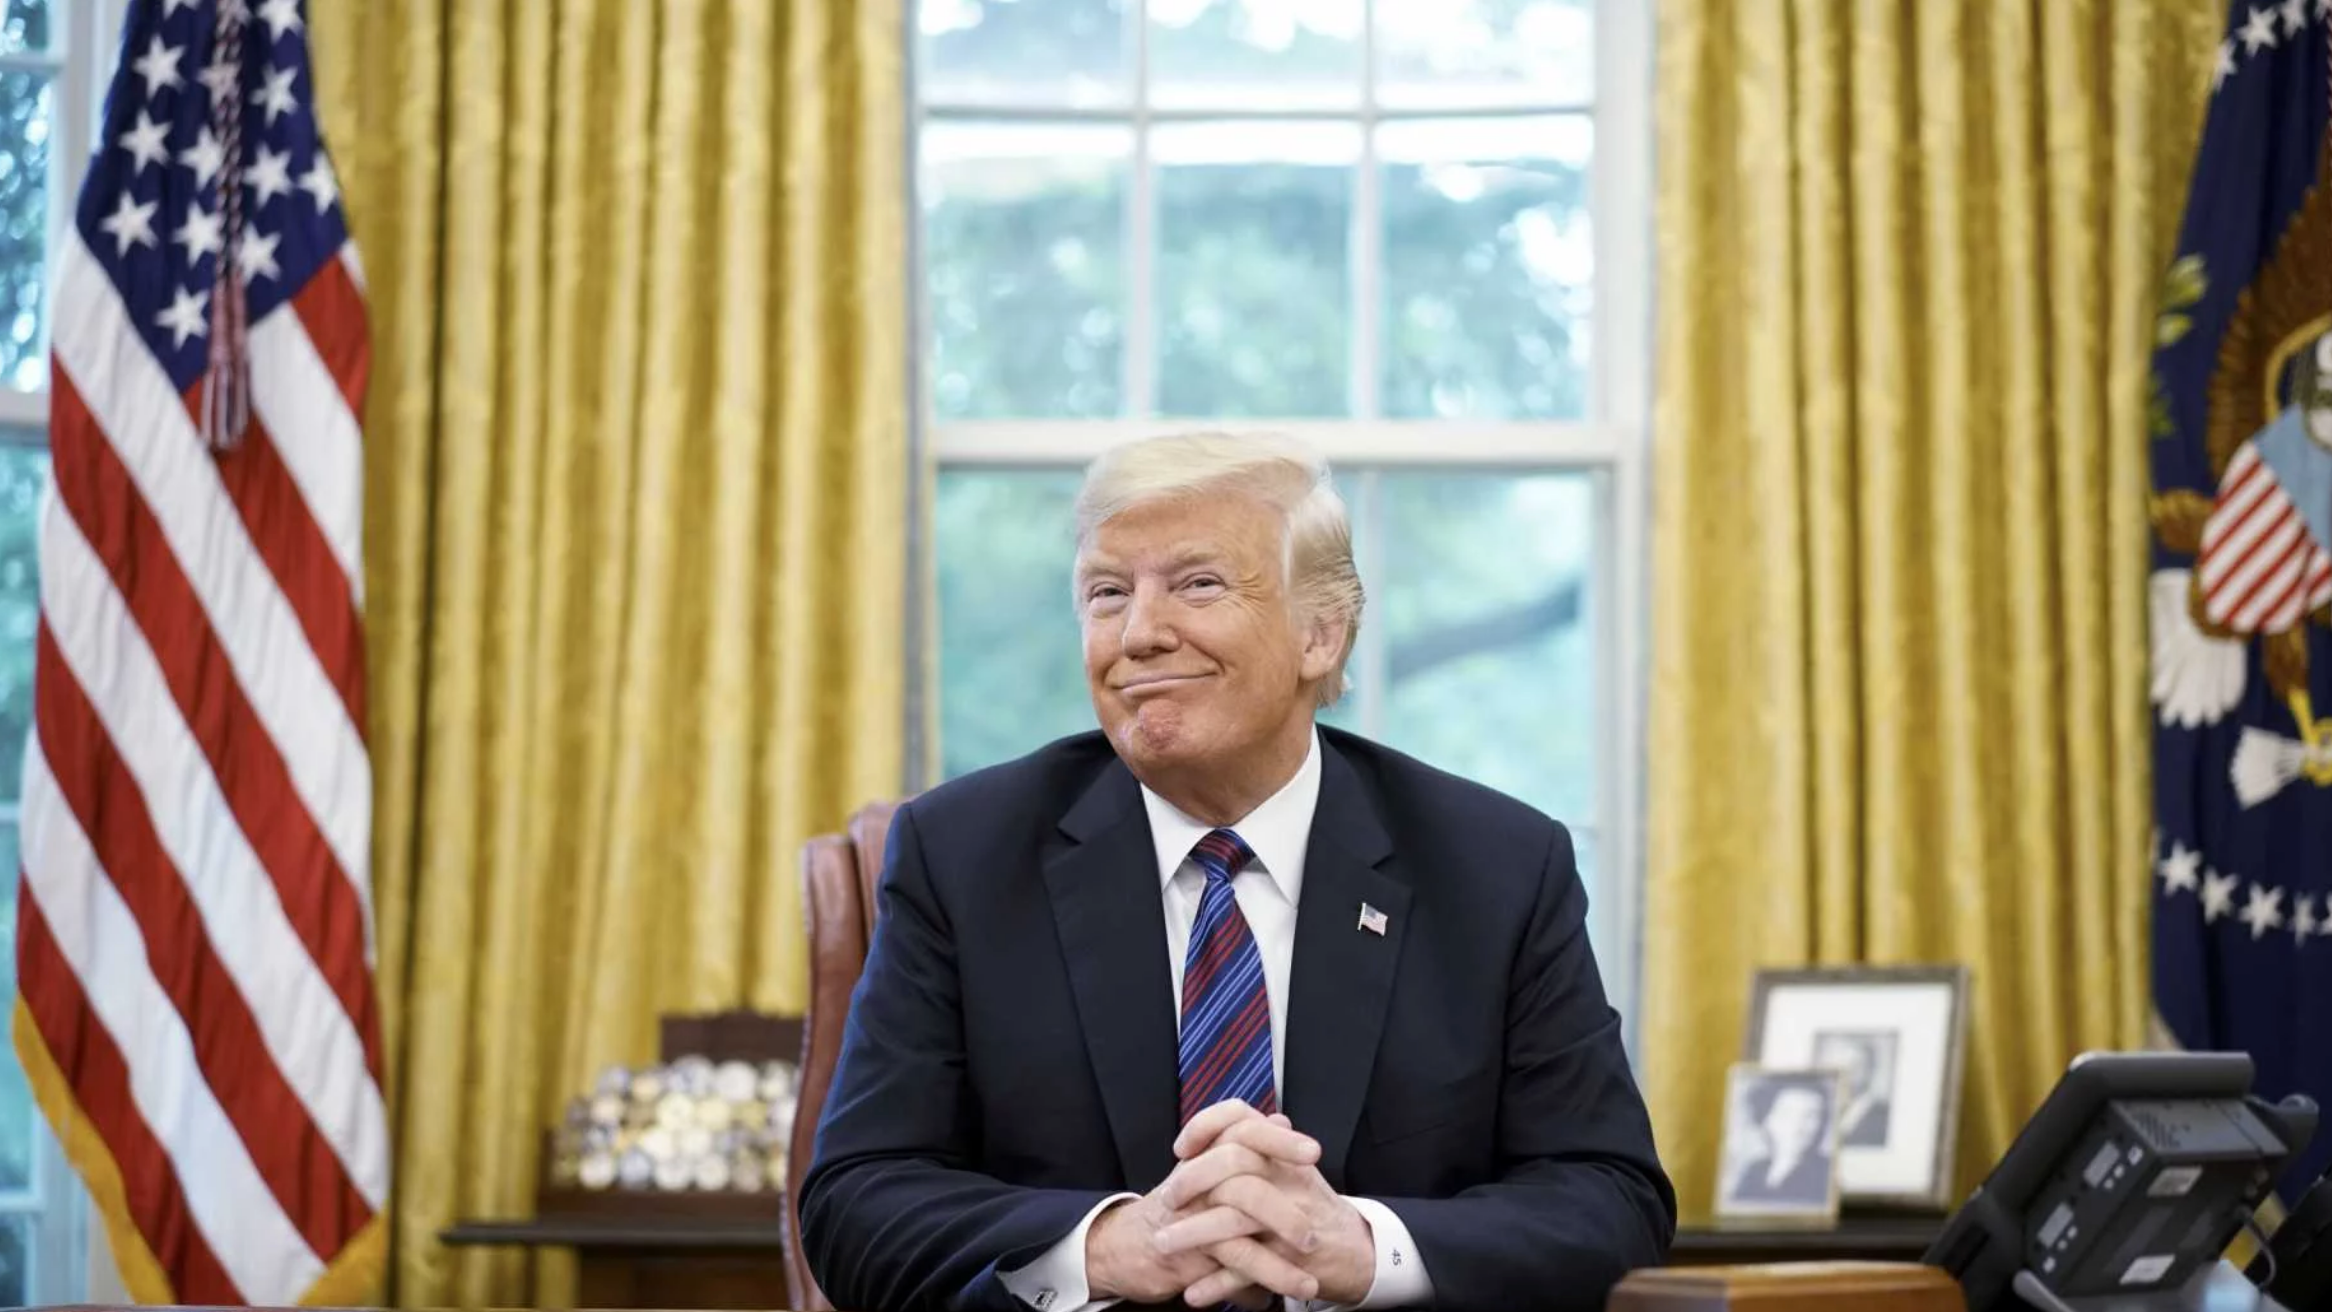 Mandel Ngan / AFP / Getty Images